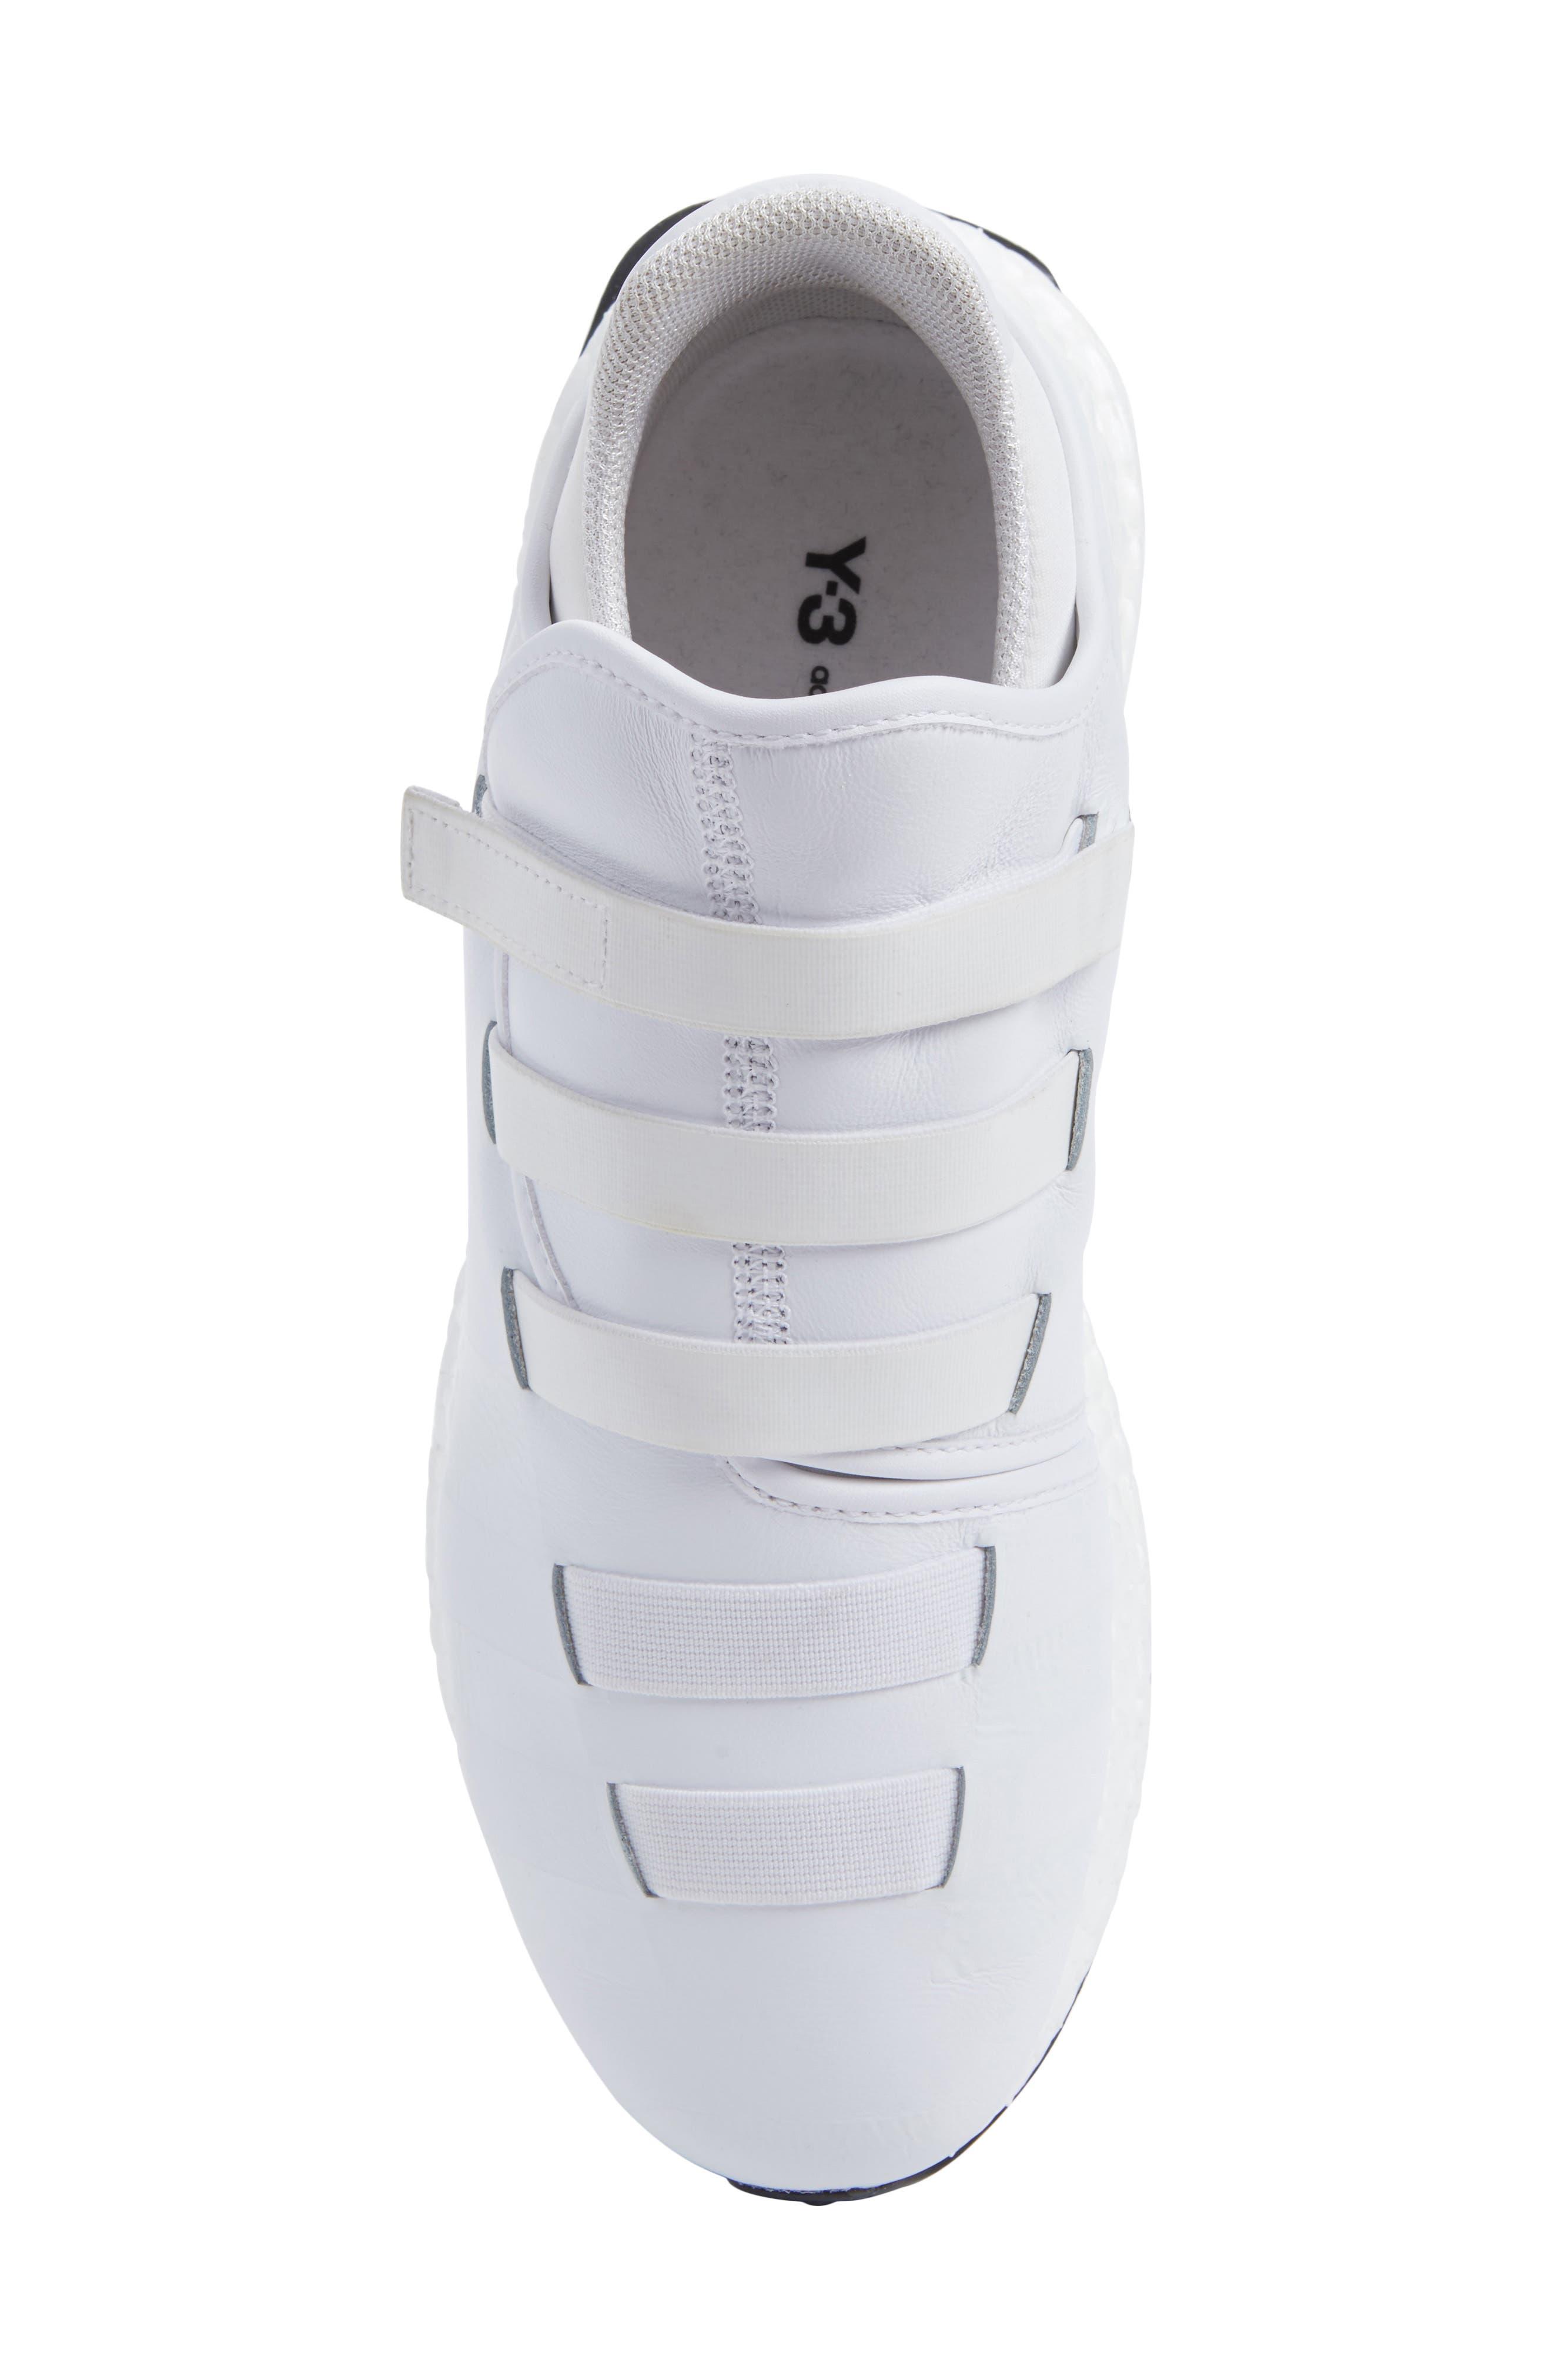 Zazu Strappy Sneaker,                             Alternate thumbnail 5, color,                             100